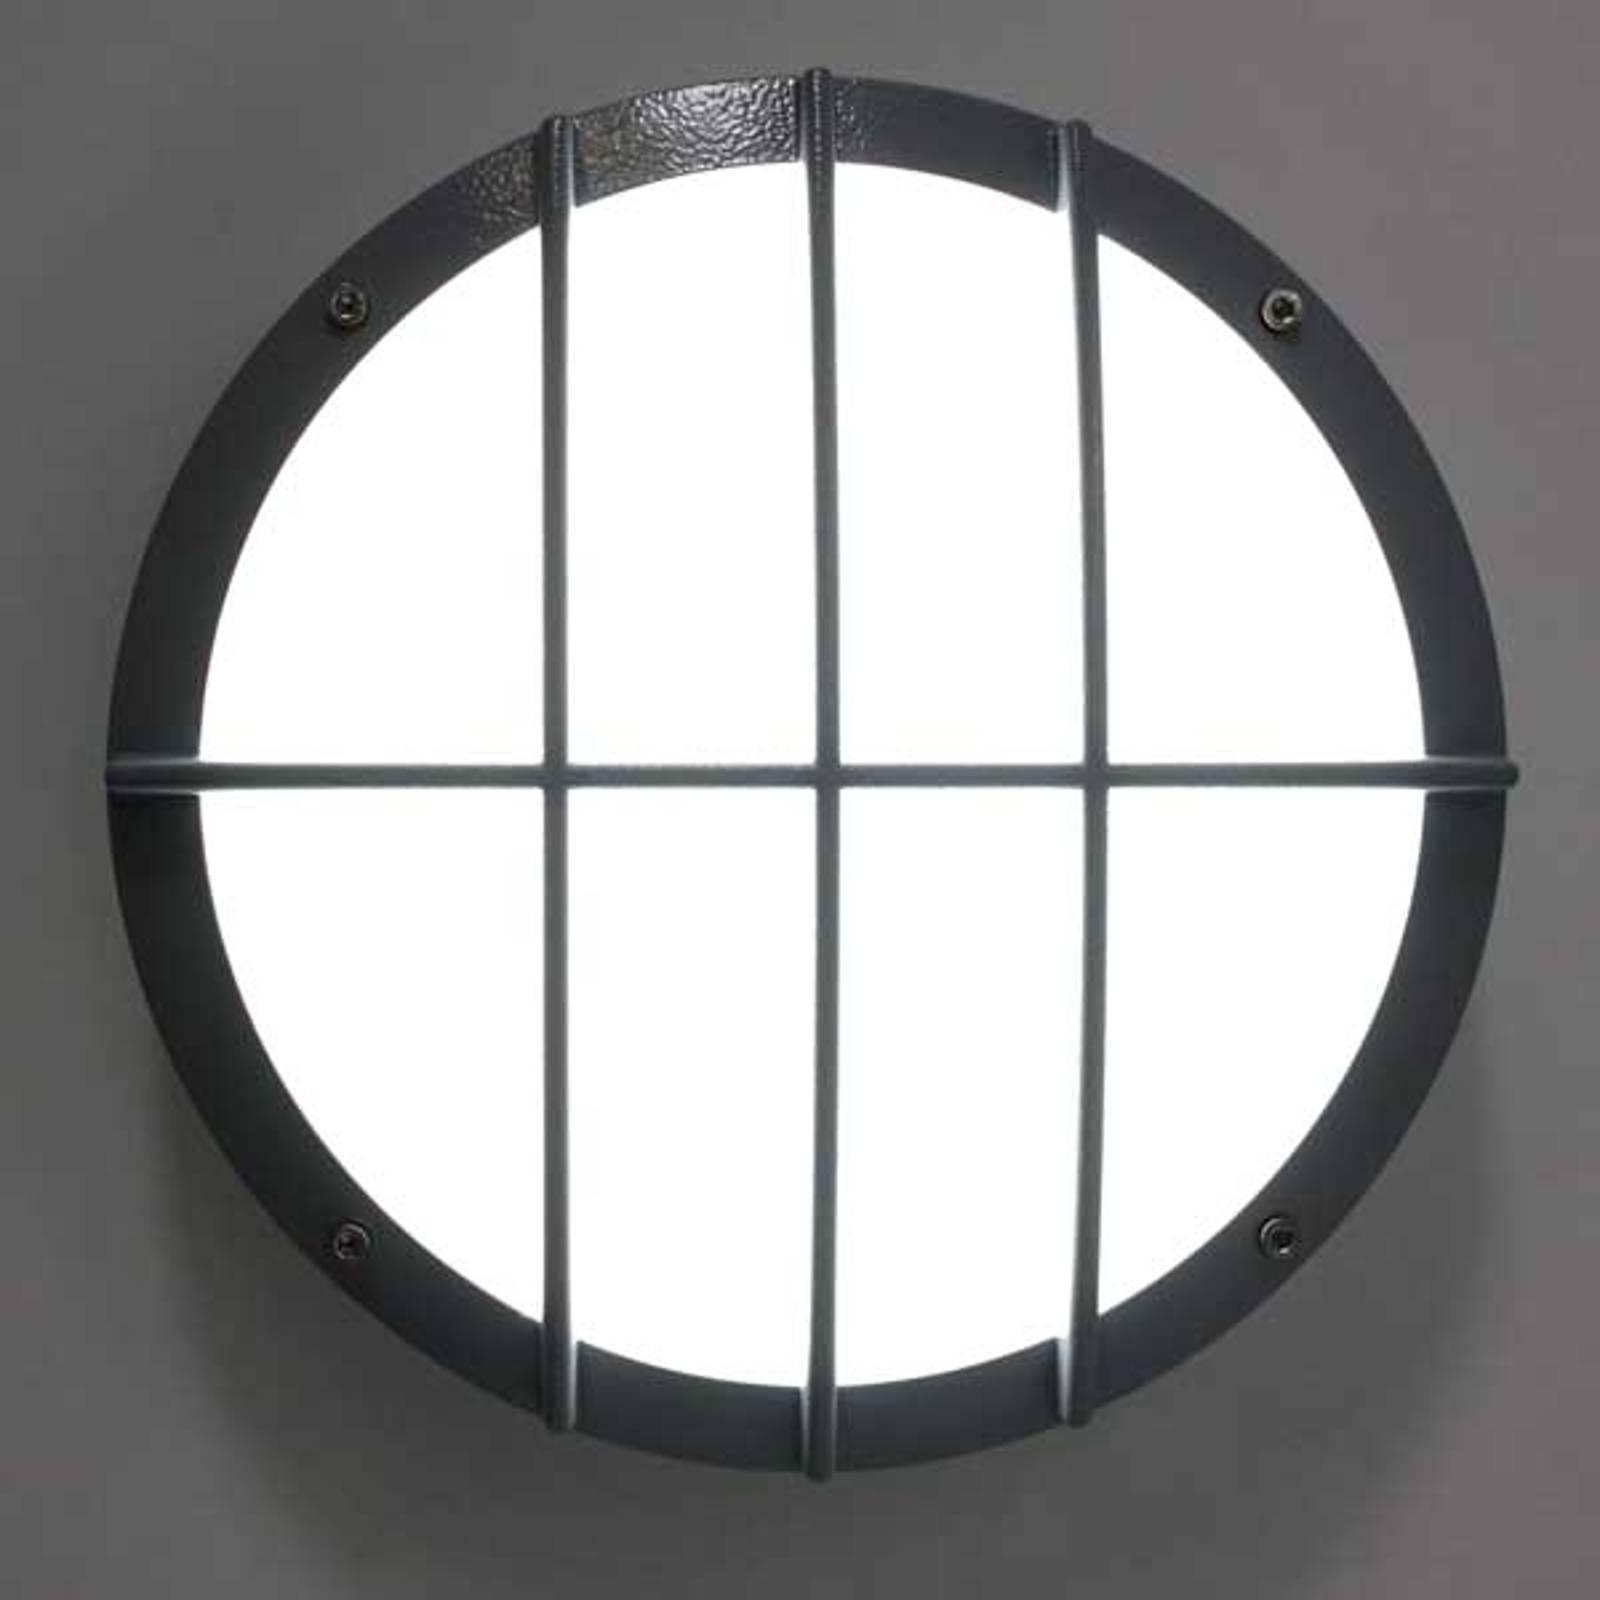 Wandlamp v aluminium spuitgietw SUN 8 LED 13W 4K